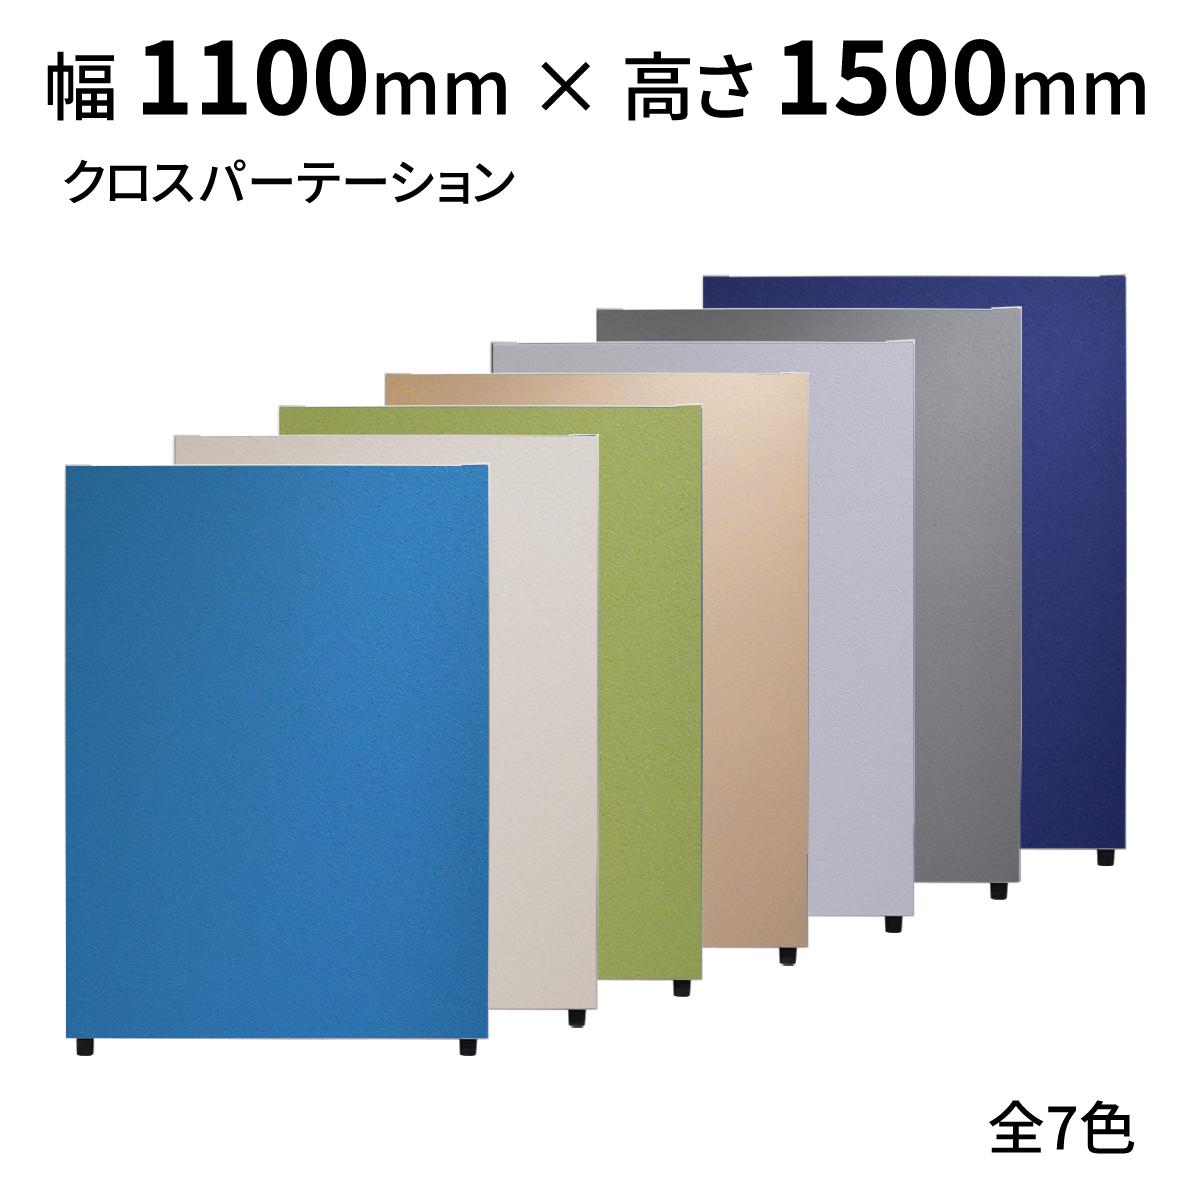 W1100mm×H1500mm日本製クロスパーテーション ローパーテーション 法人限定 オフィスパーテーション 間仕切り 衝立 両側用安定脚(低床タイプ)1個付き